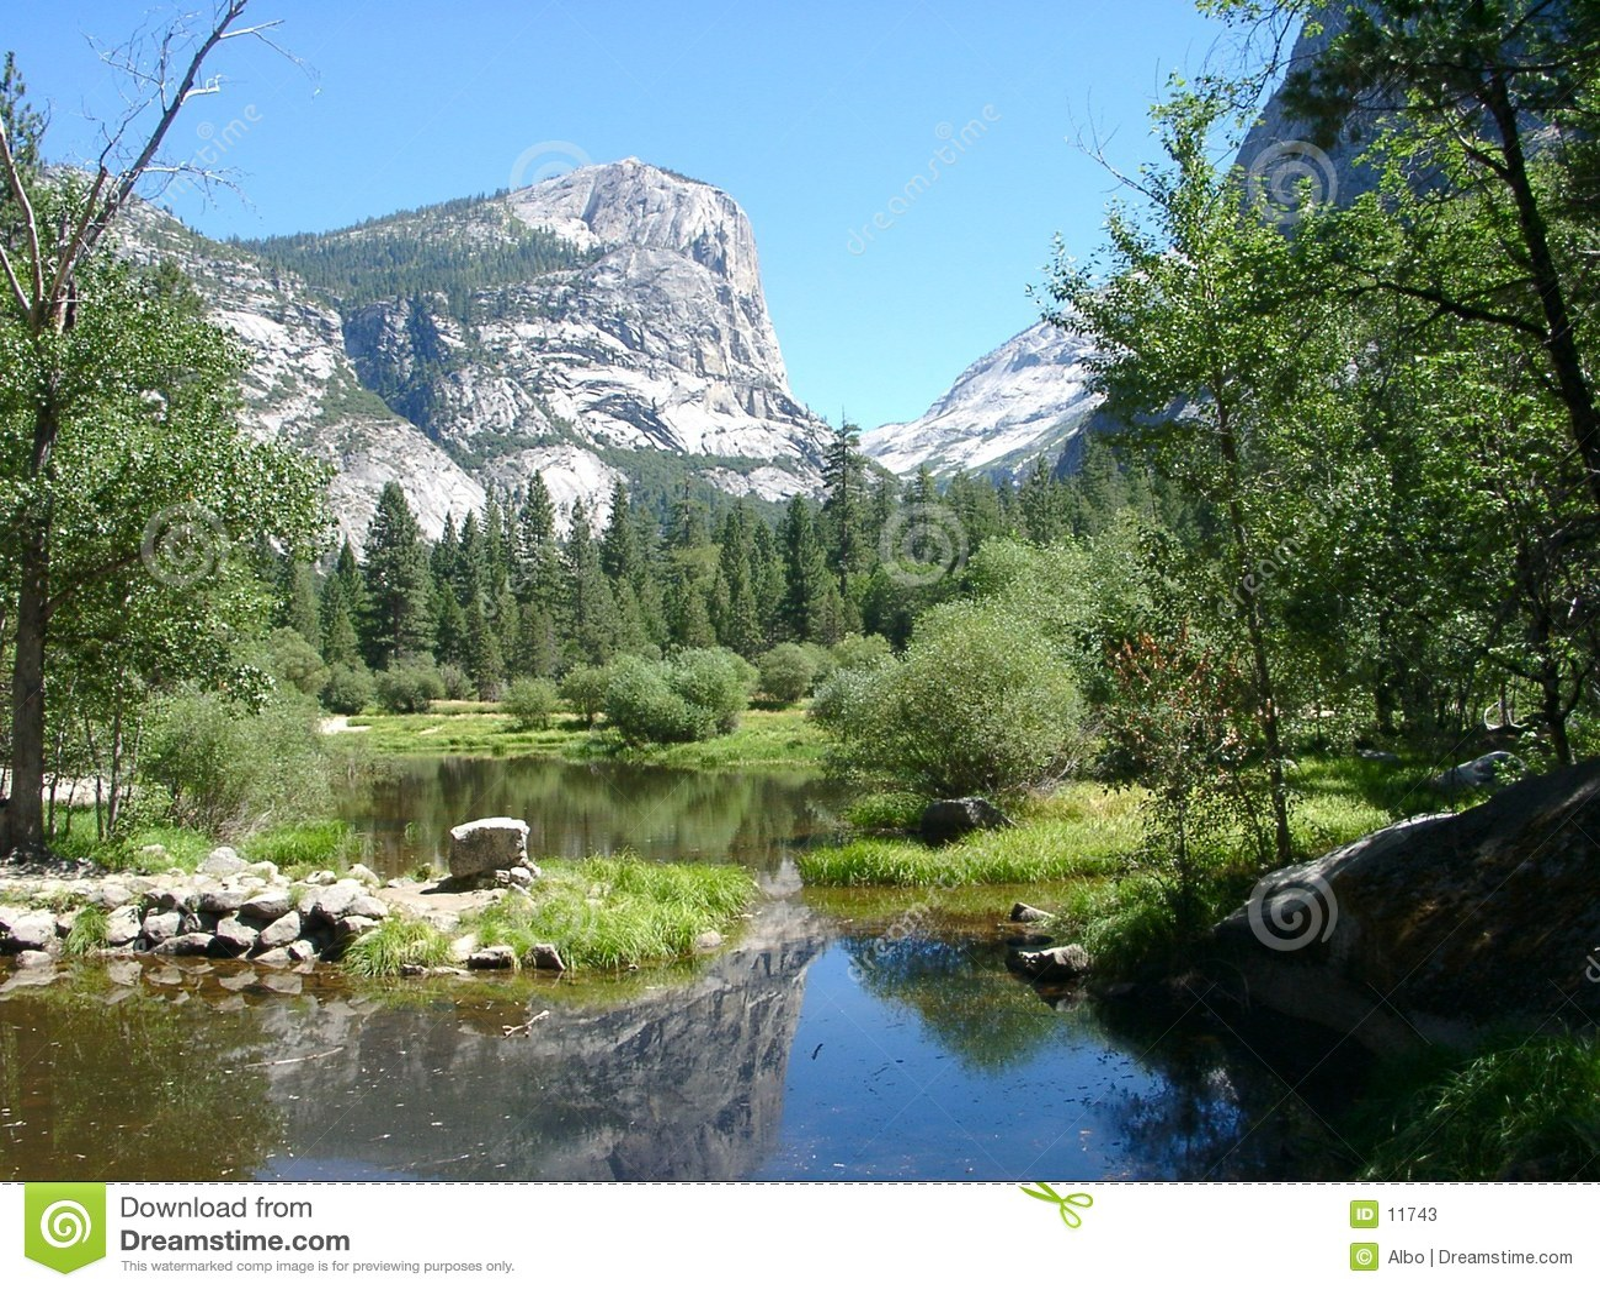 Yosemite: Mirror See